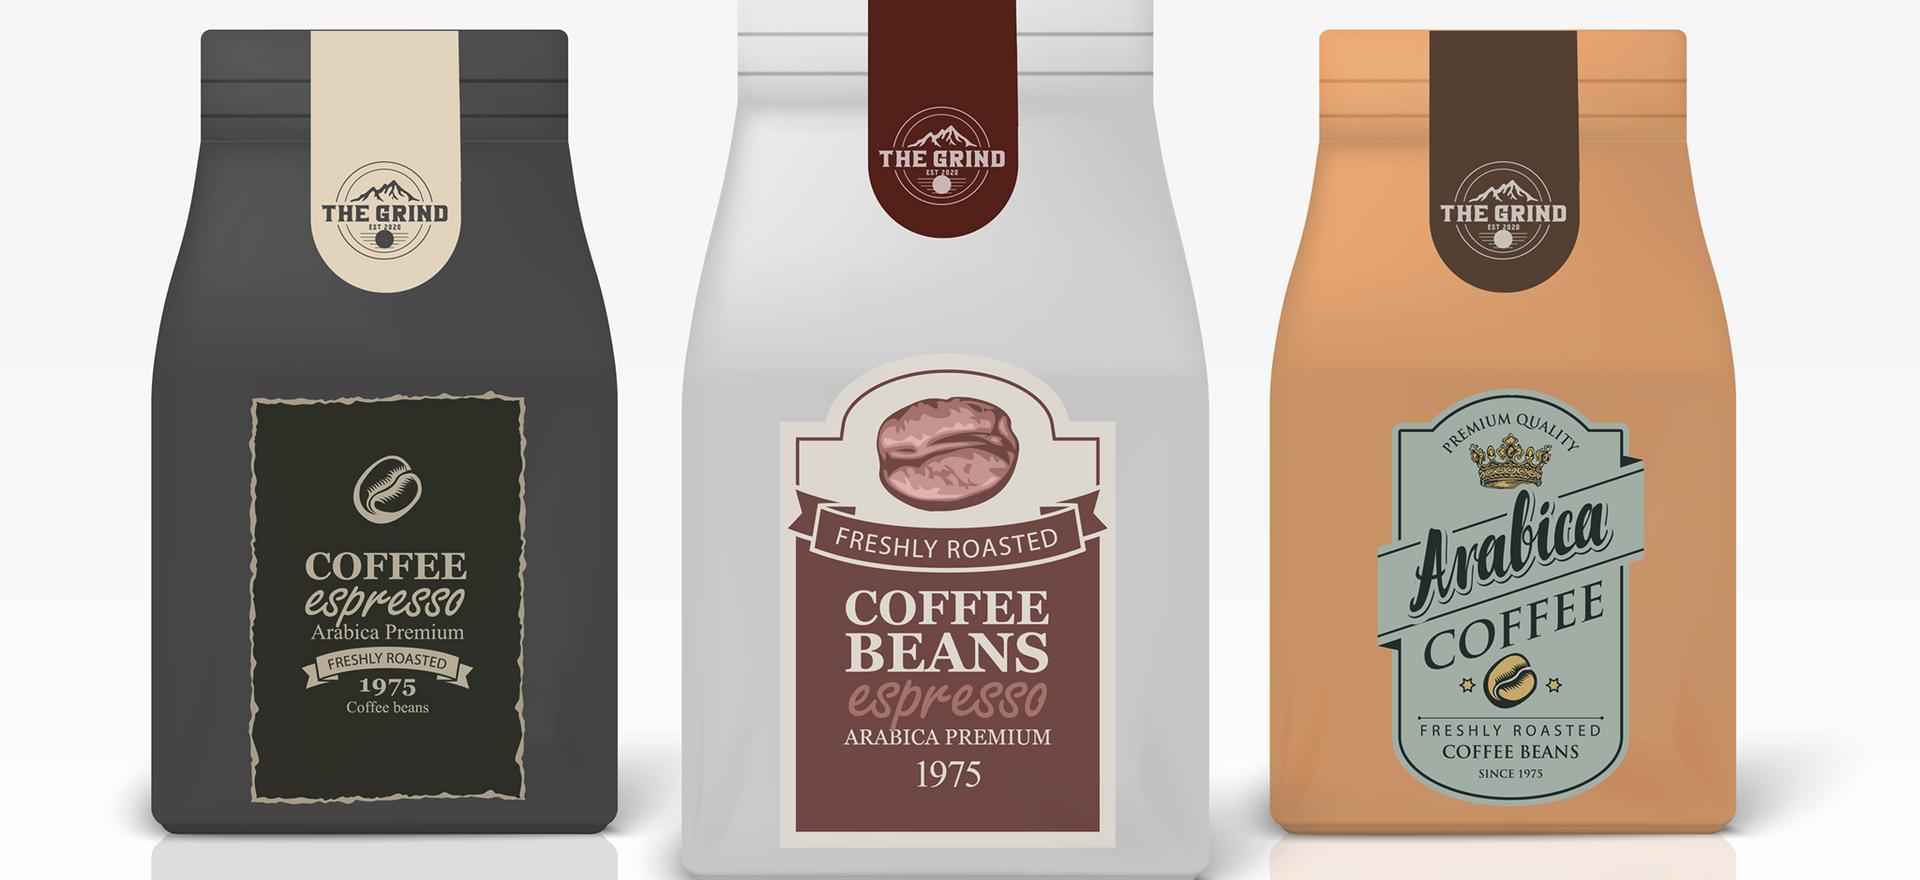 Coffee is _____